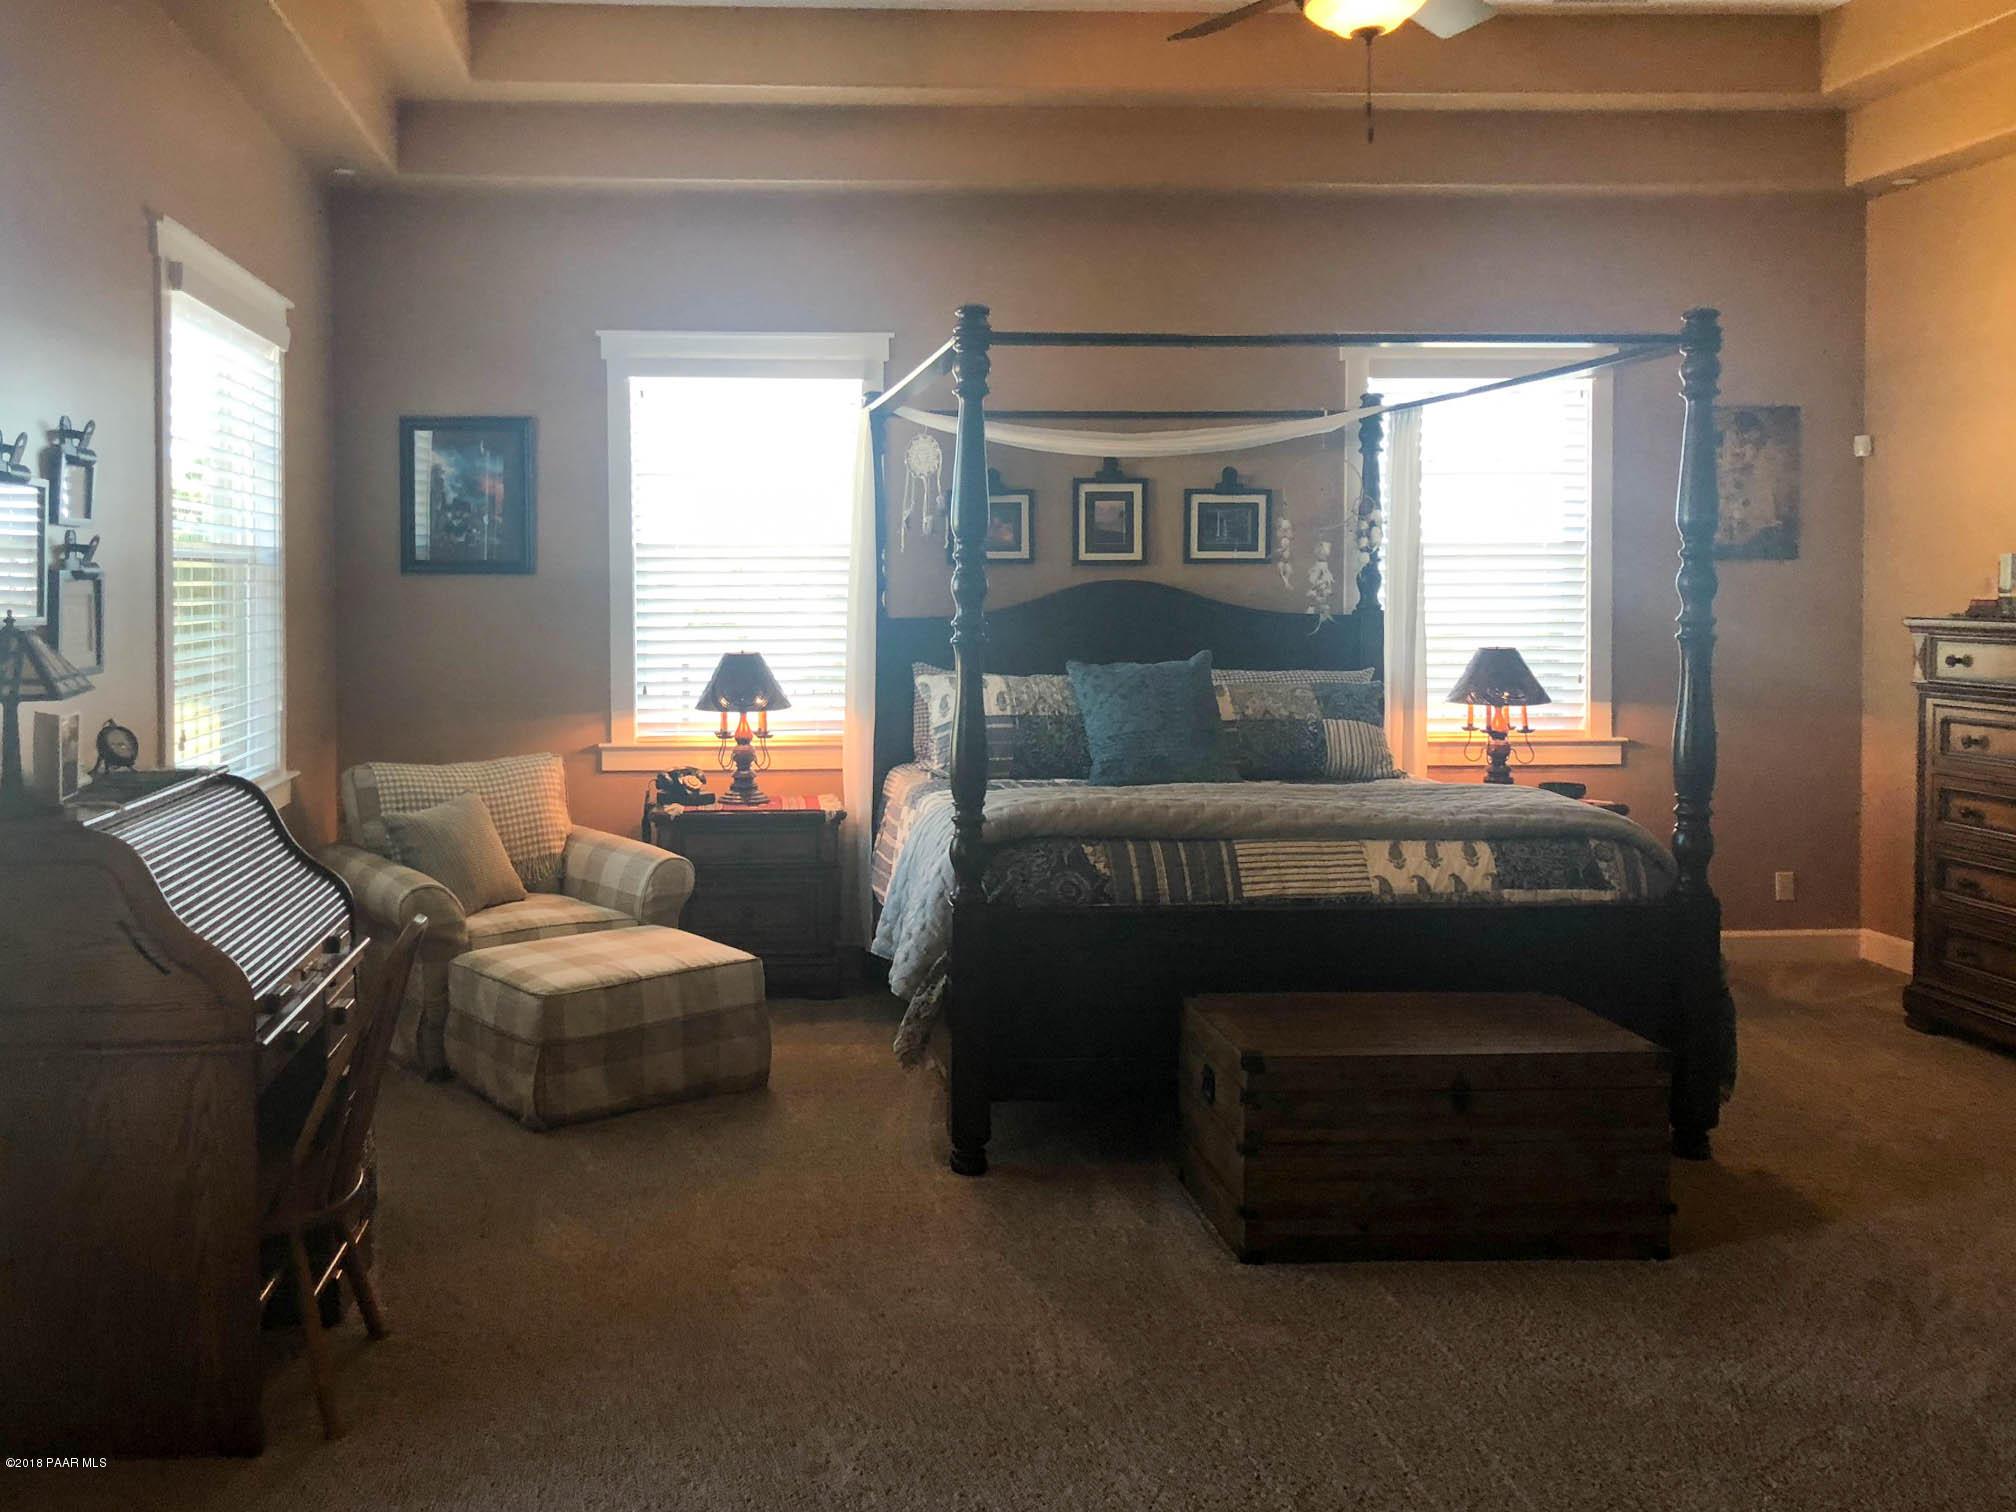 116 Morning Glow Way Prescott, AZ 86303 - MLS #: 1015832